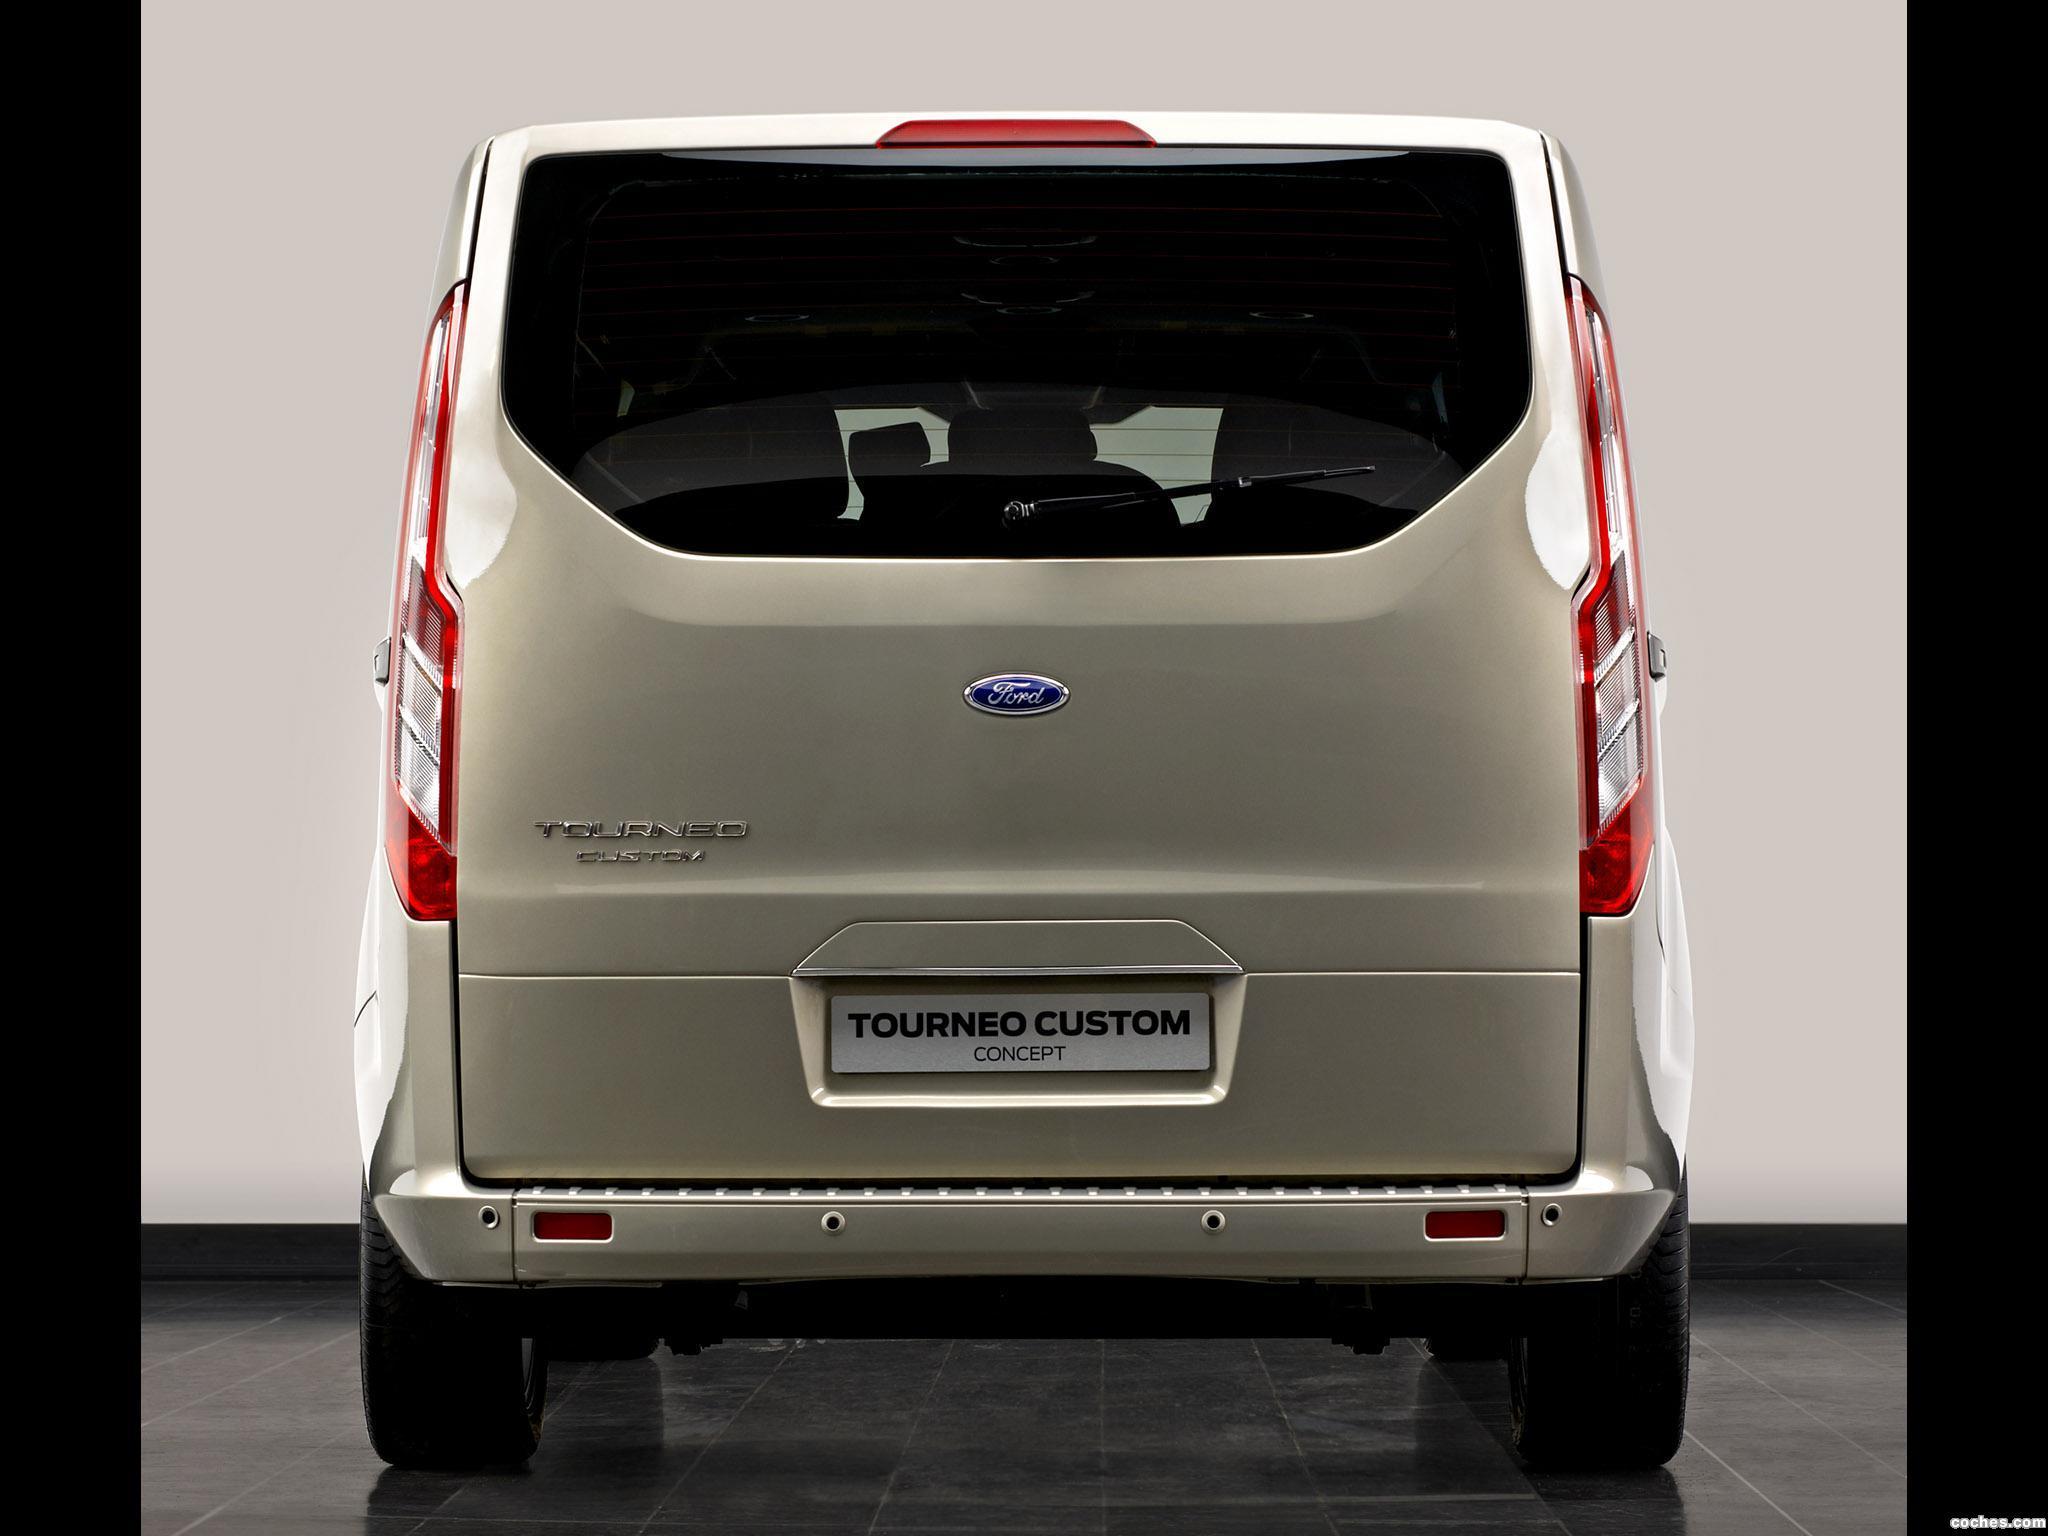 Foto 1 de Ford Tourneo Custom Concept 2012